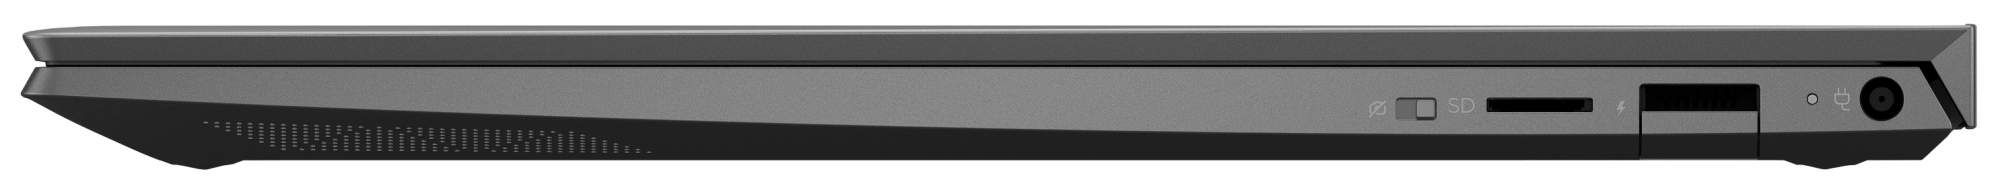 Ультрабук HP ENVY x360 Convert 13-ay0028ur 286T0EA